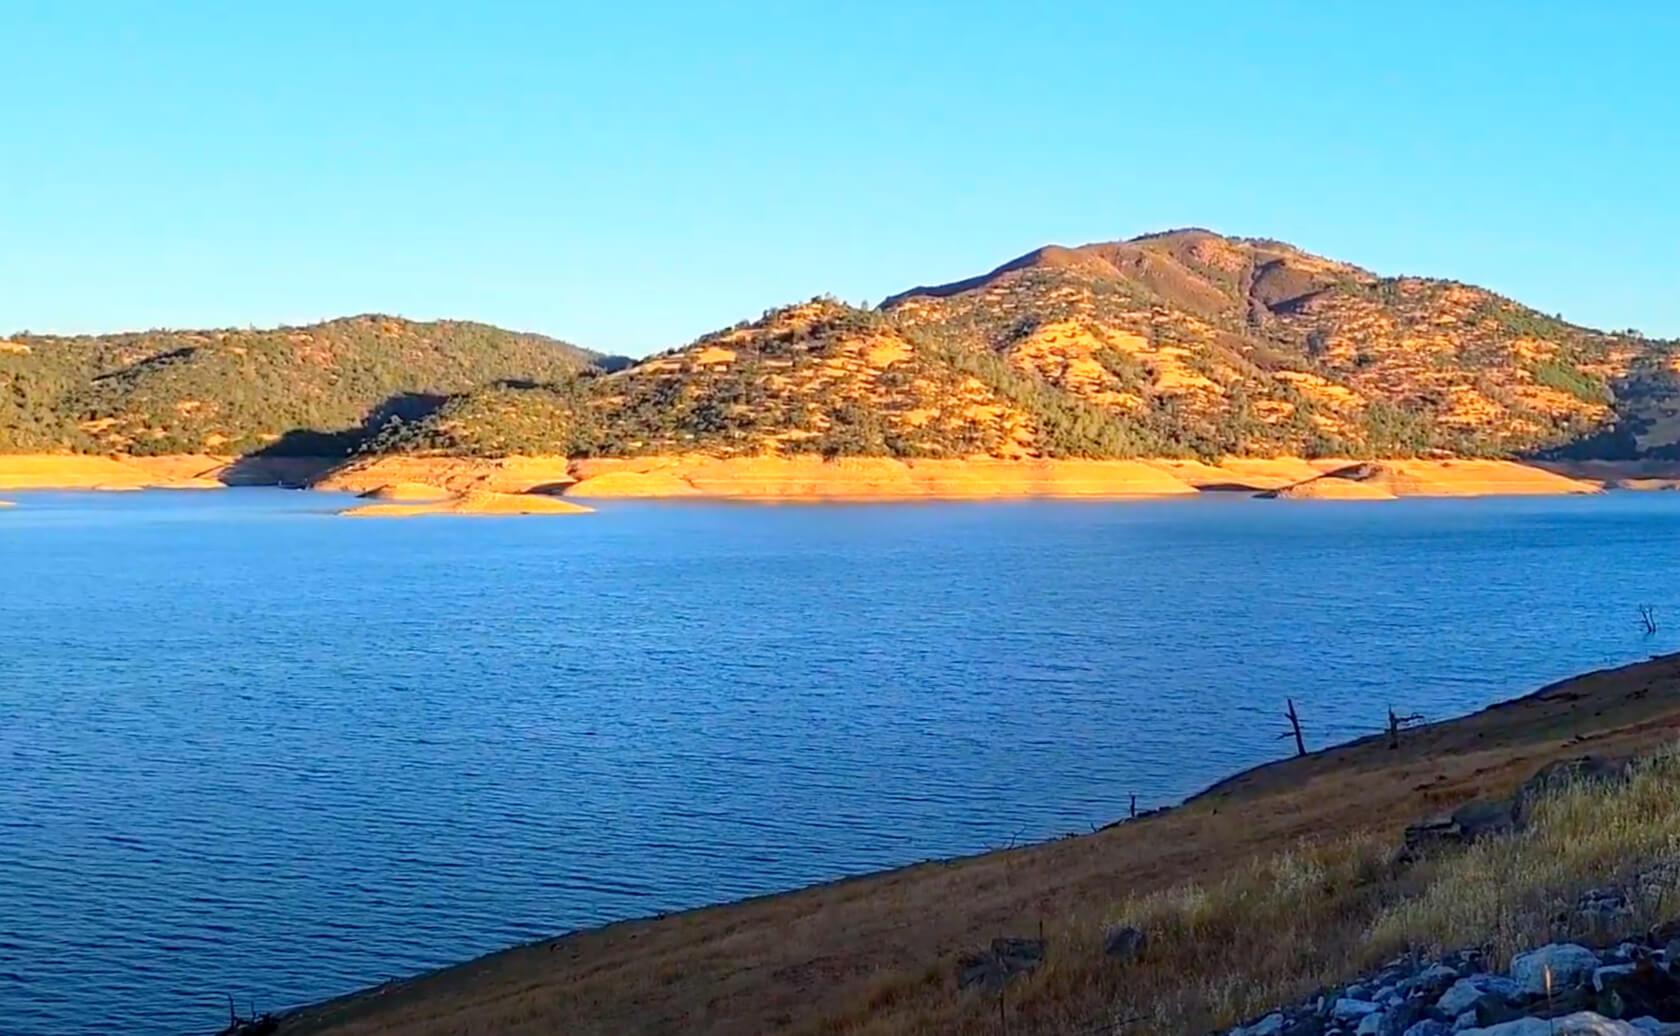 New-Melones-Lake-Fishing-Guide-Report-California-08